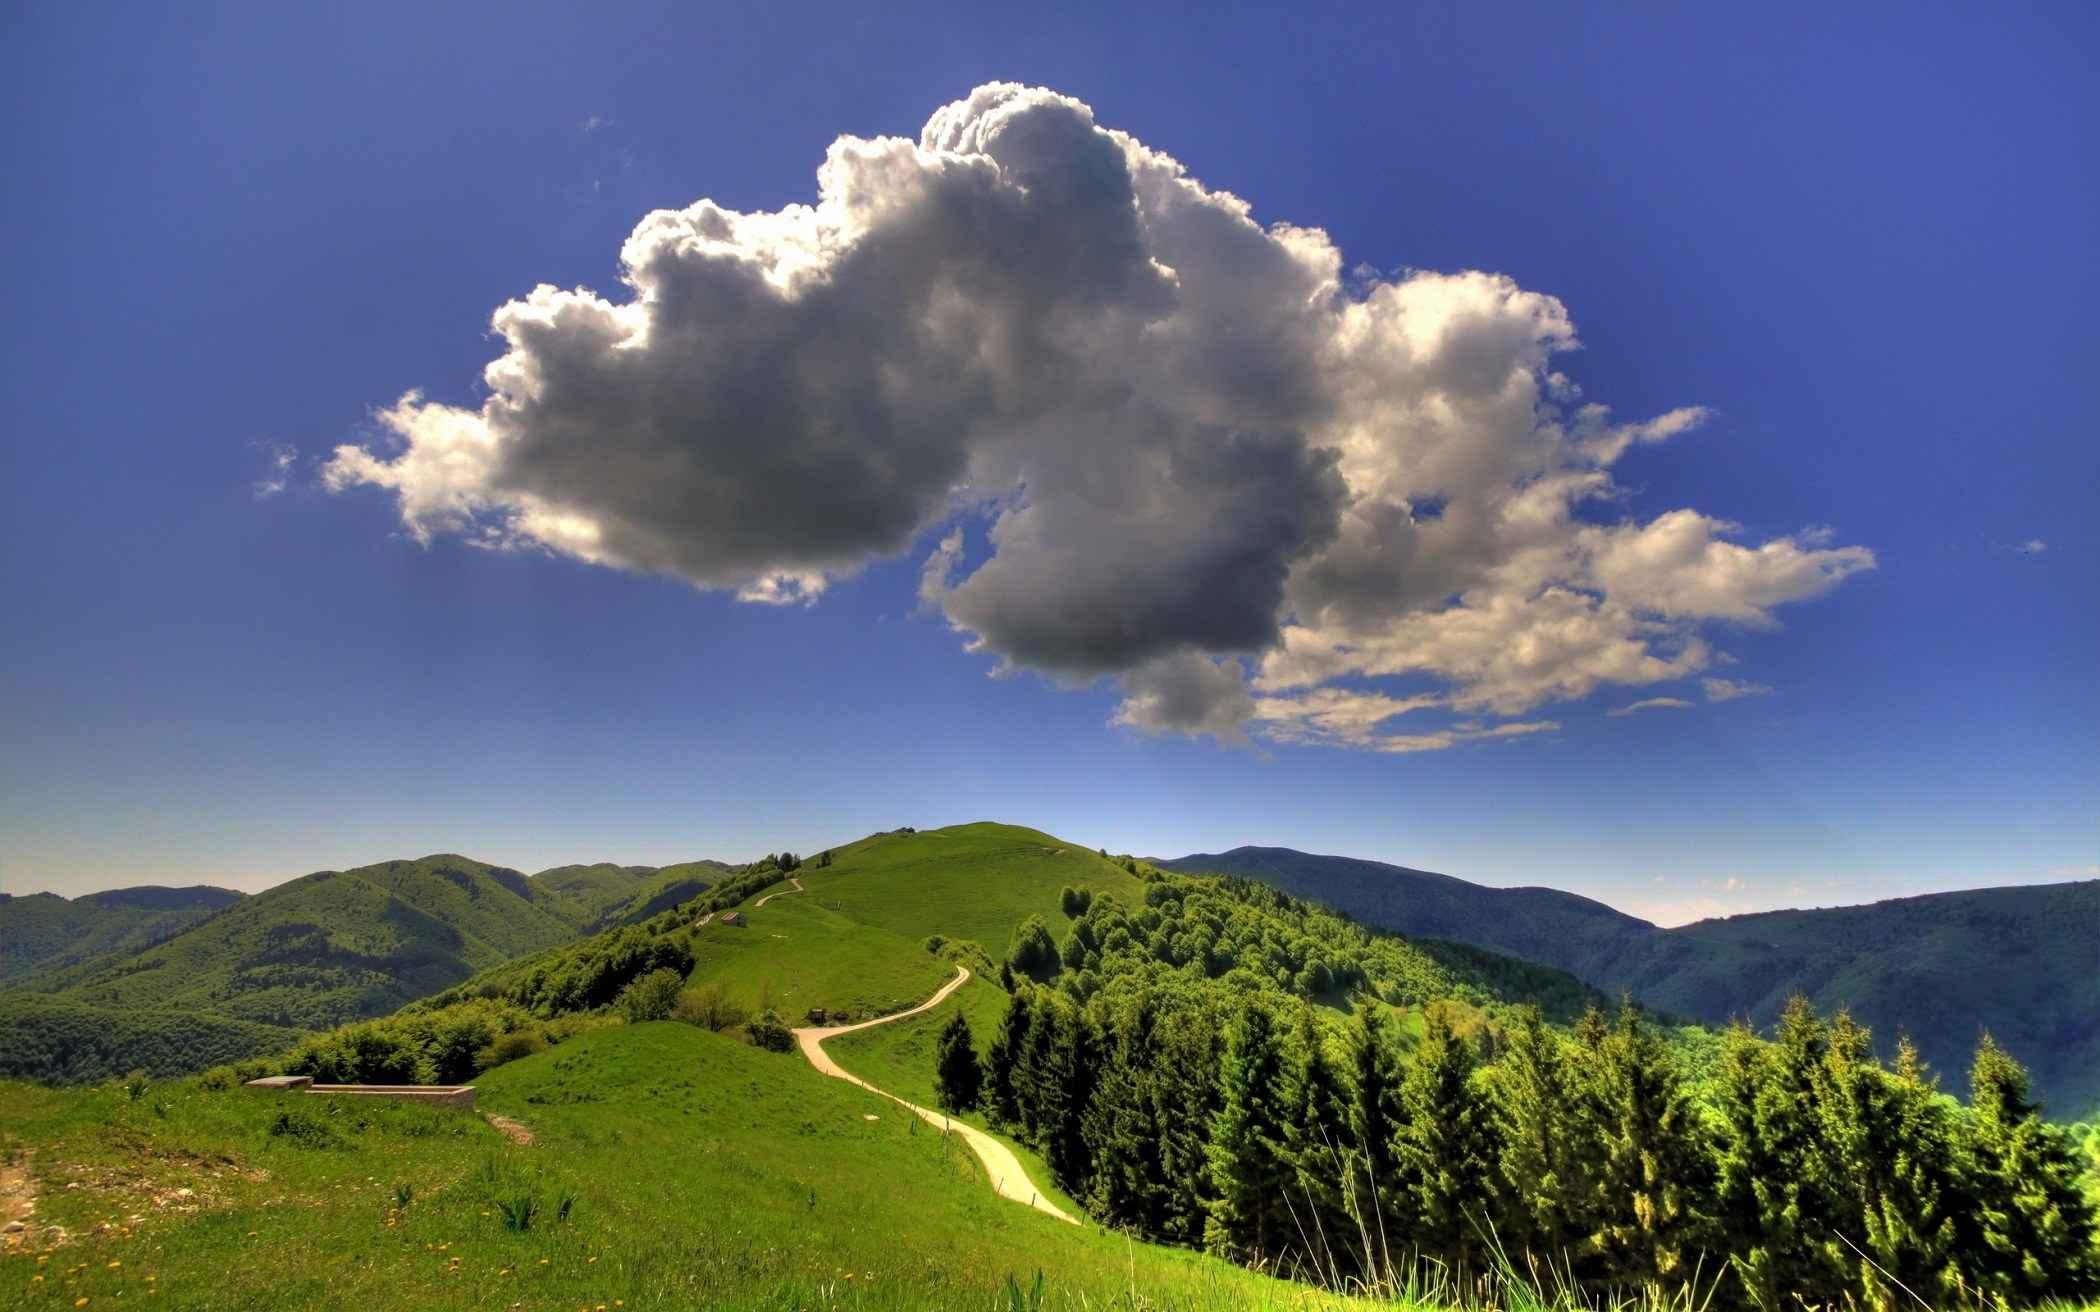 Clouds Wallpaper 043